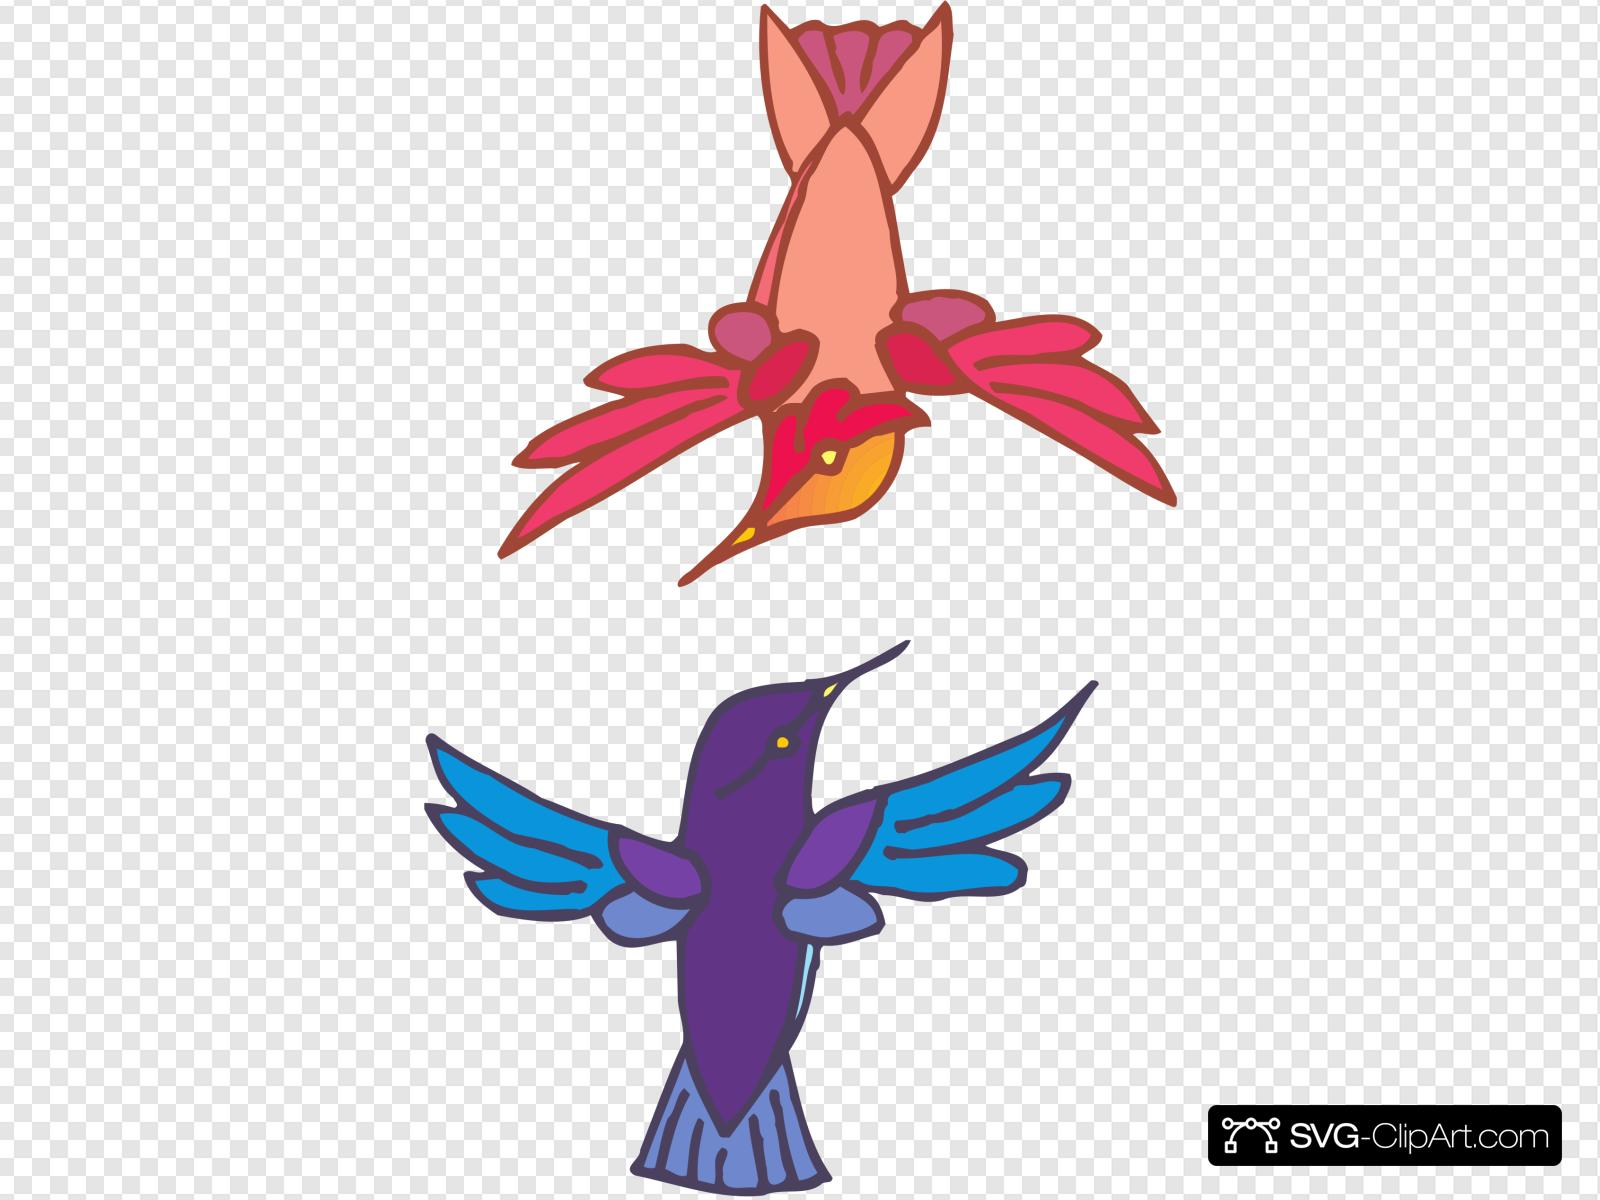 Hummingbird clipart two. Hummingbirds clip art icon